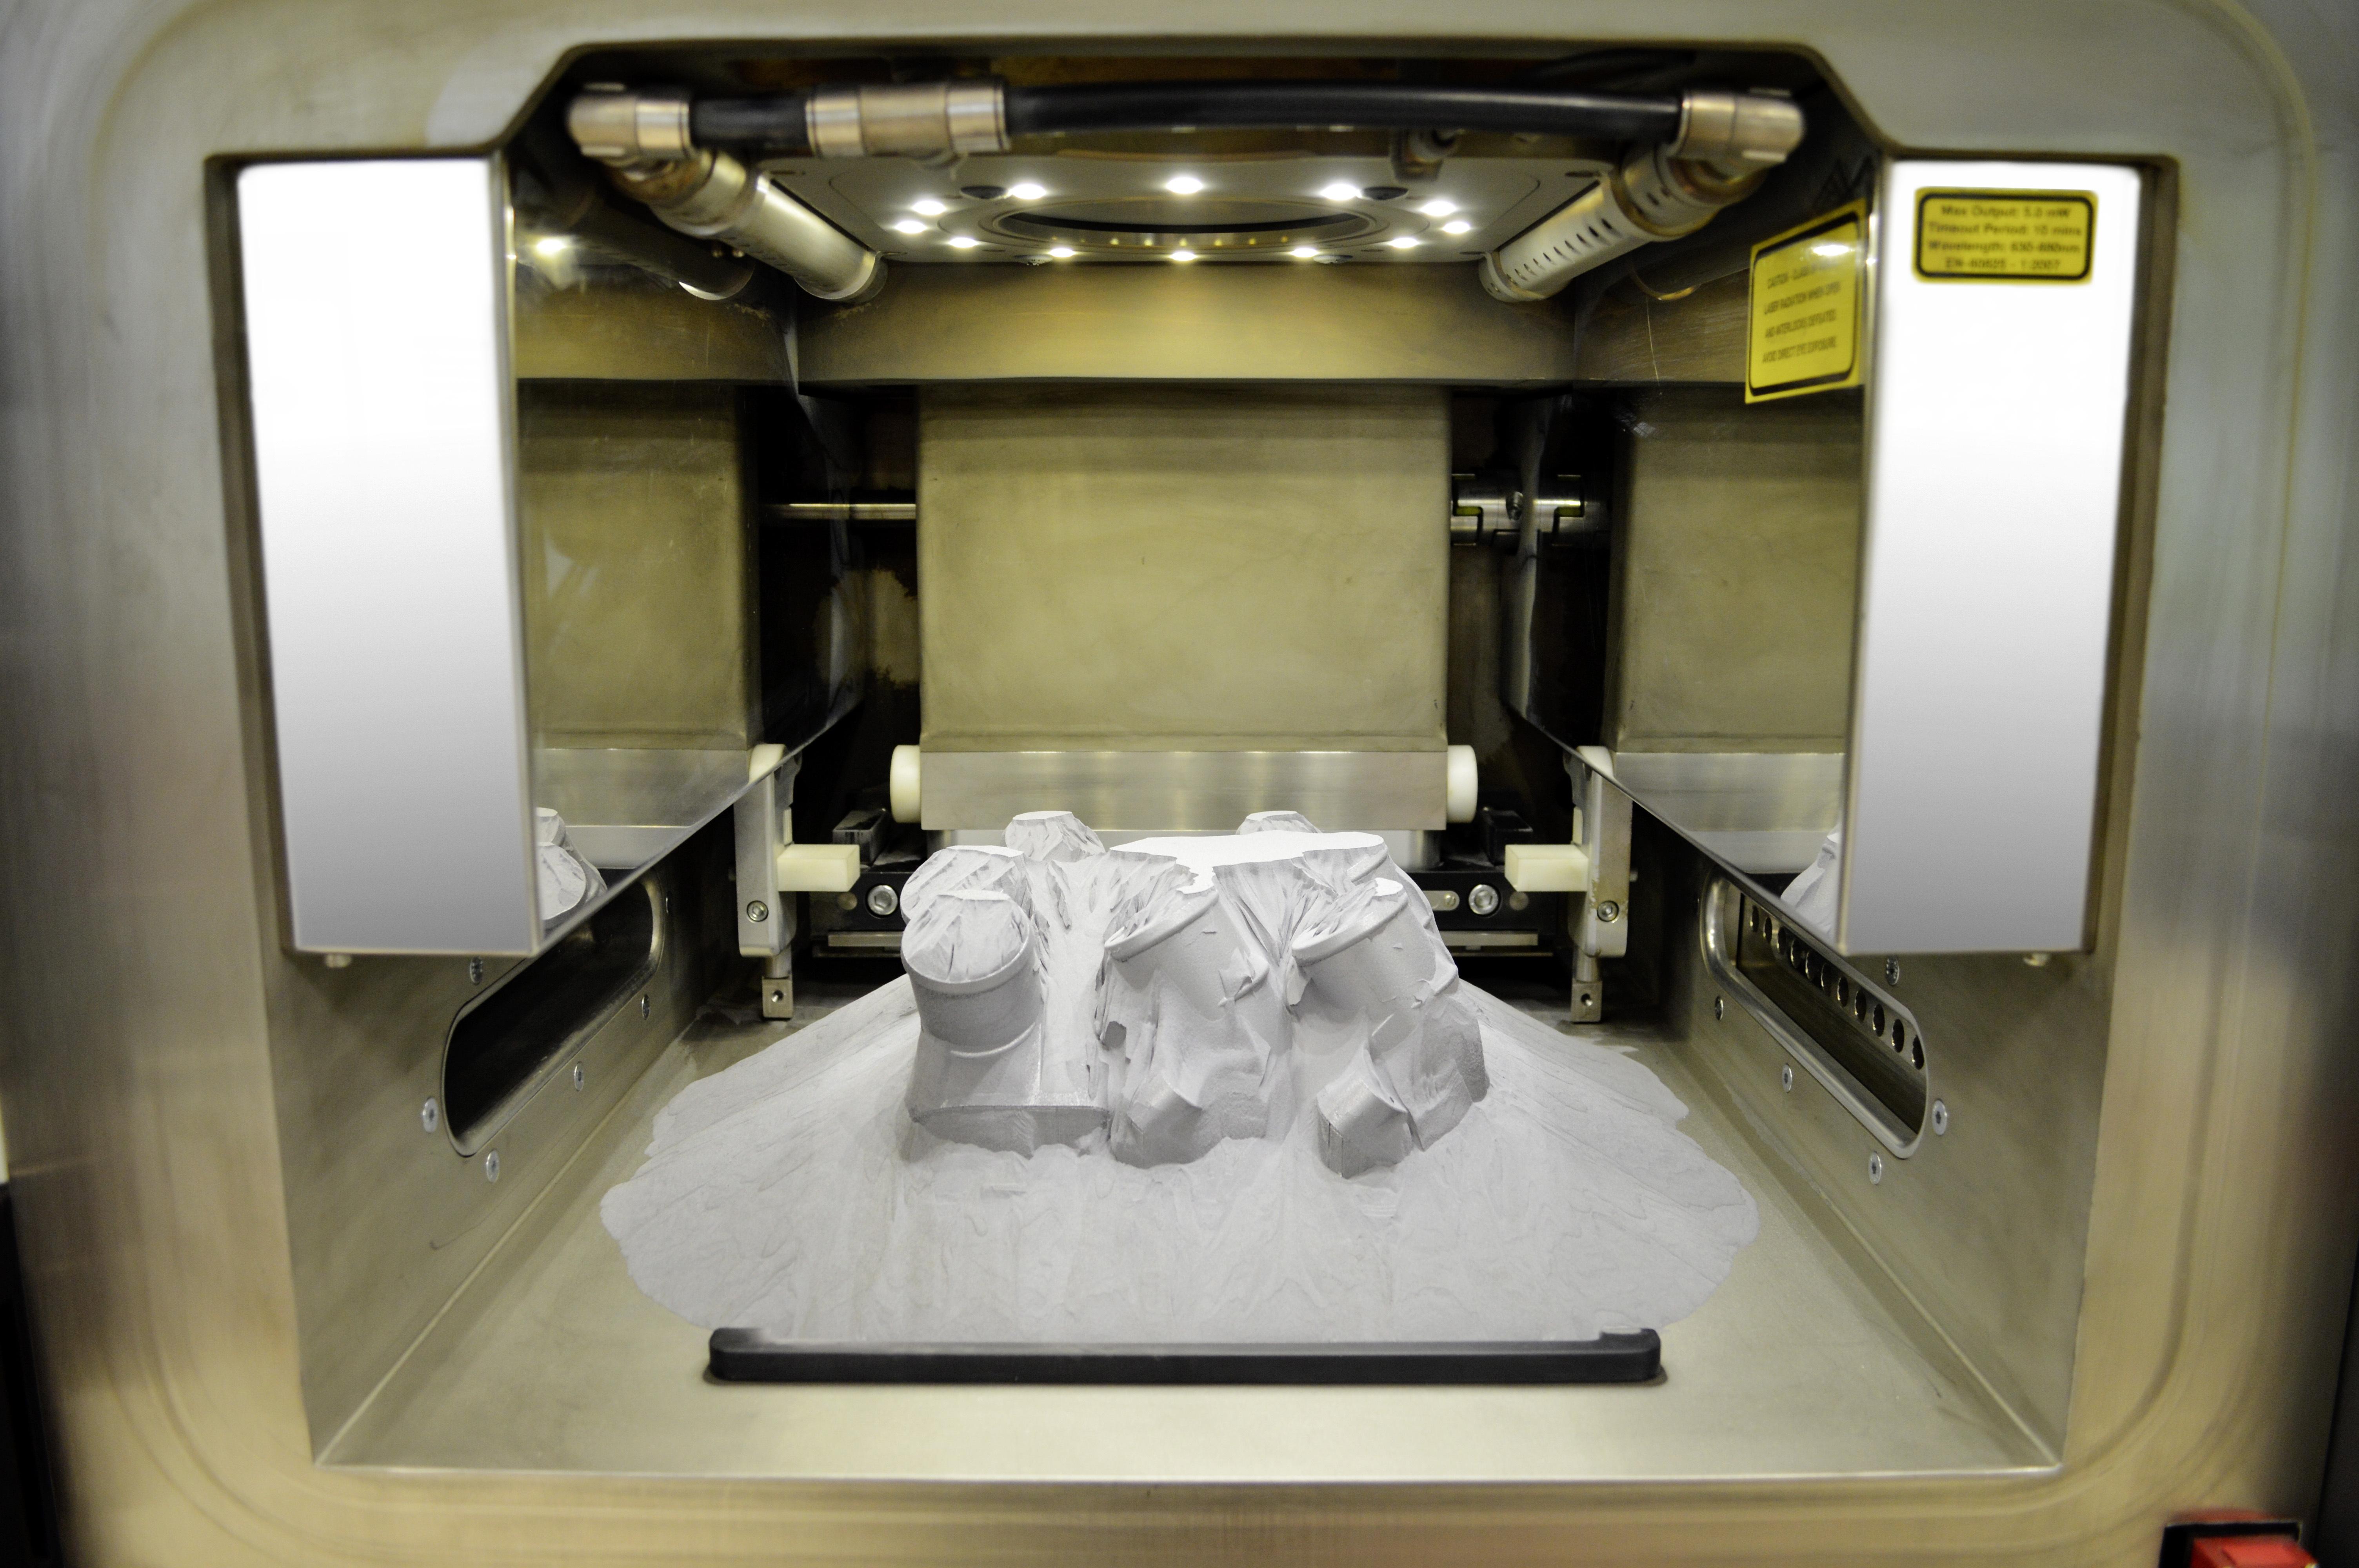 3D prints first metal spare part